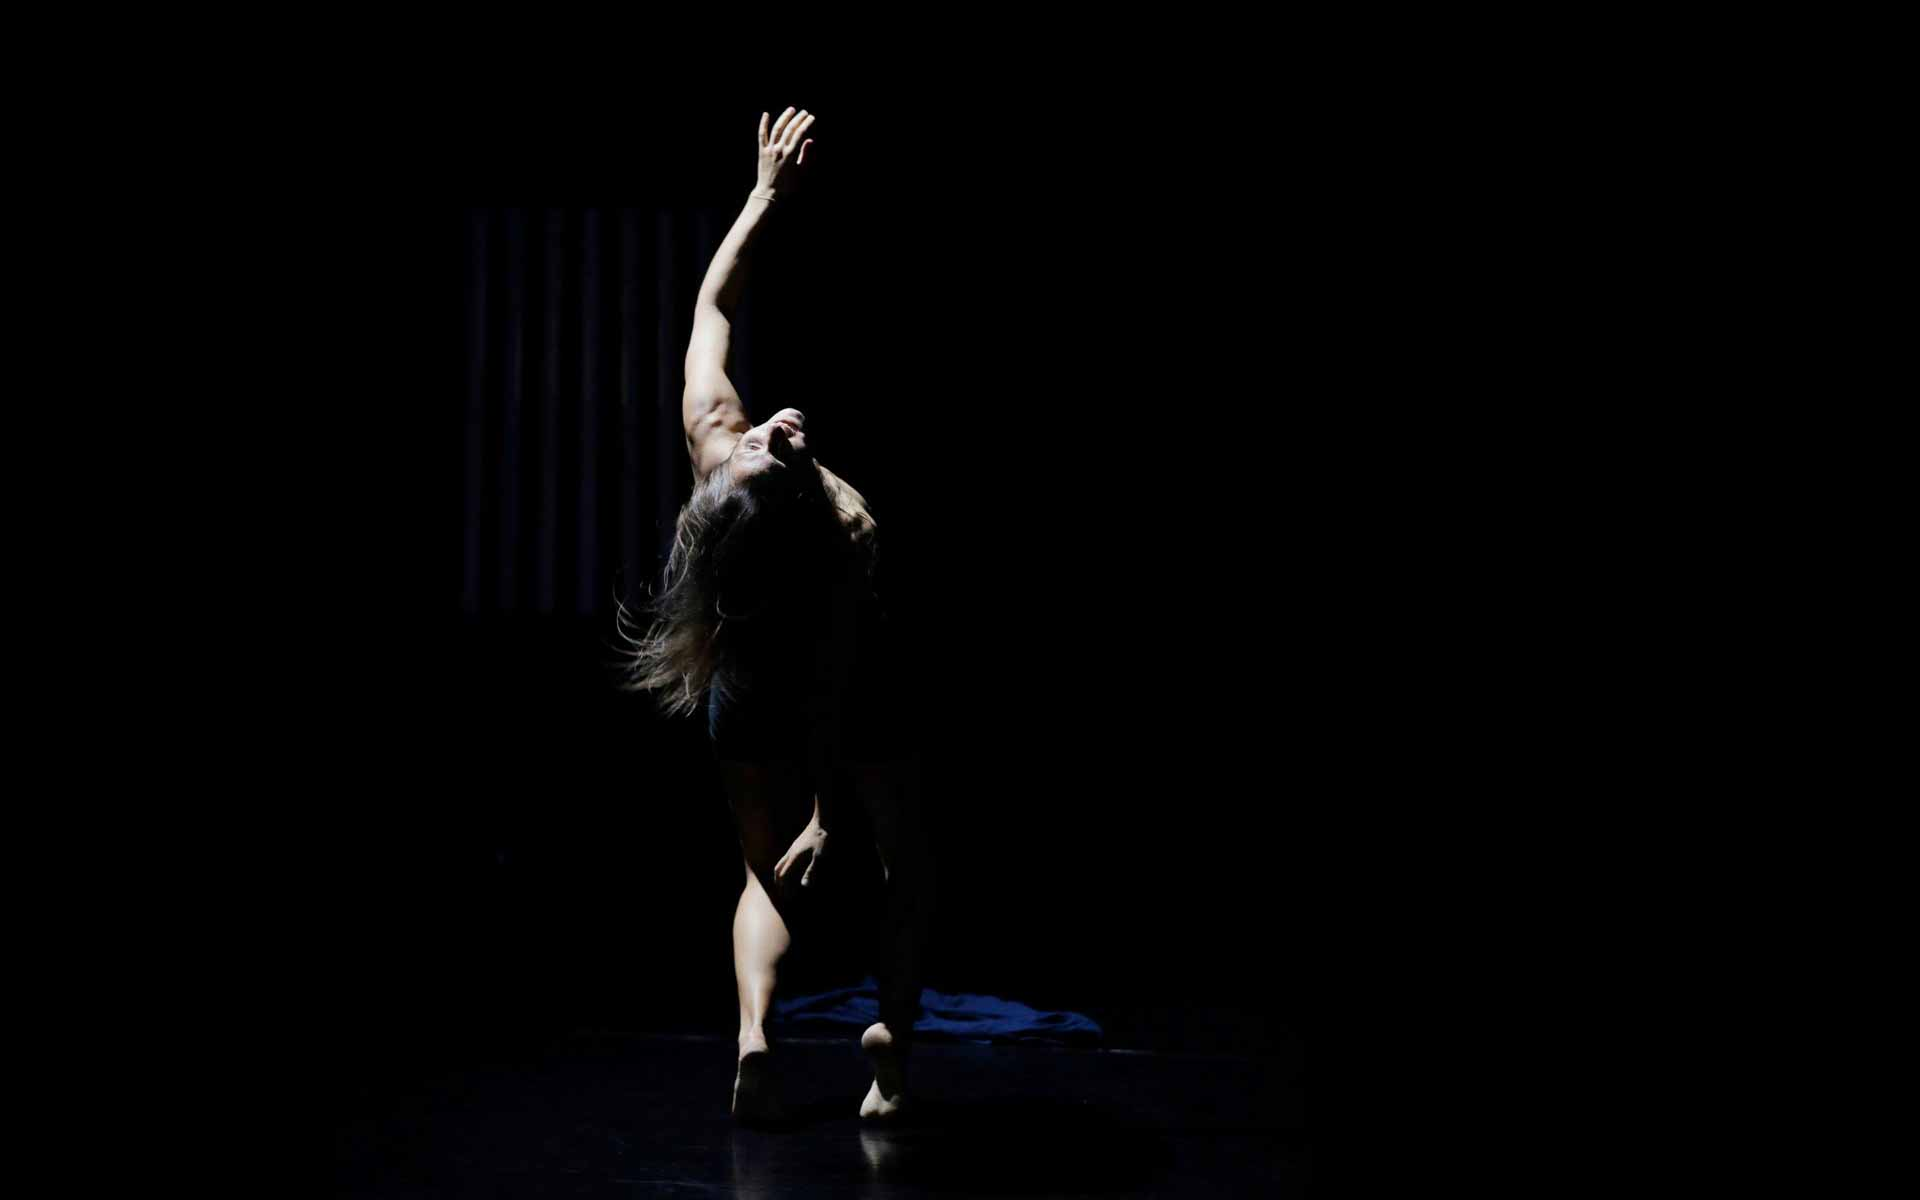 Dancer Anna Kempin stricking a modern dance pose, during her dance performance called InBetWeEn A Shock